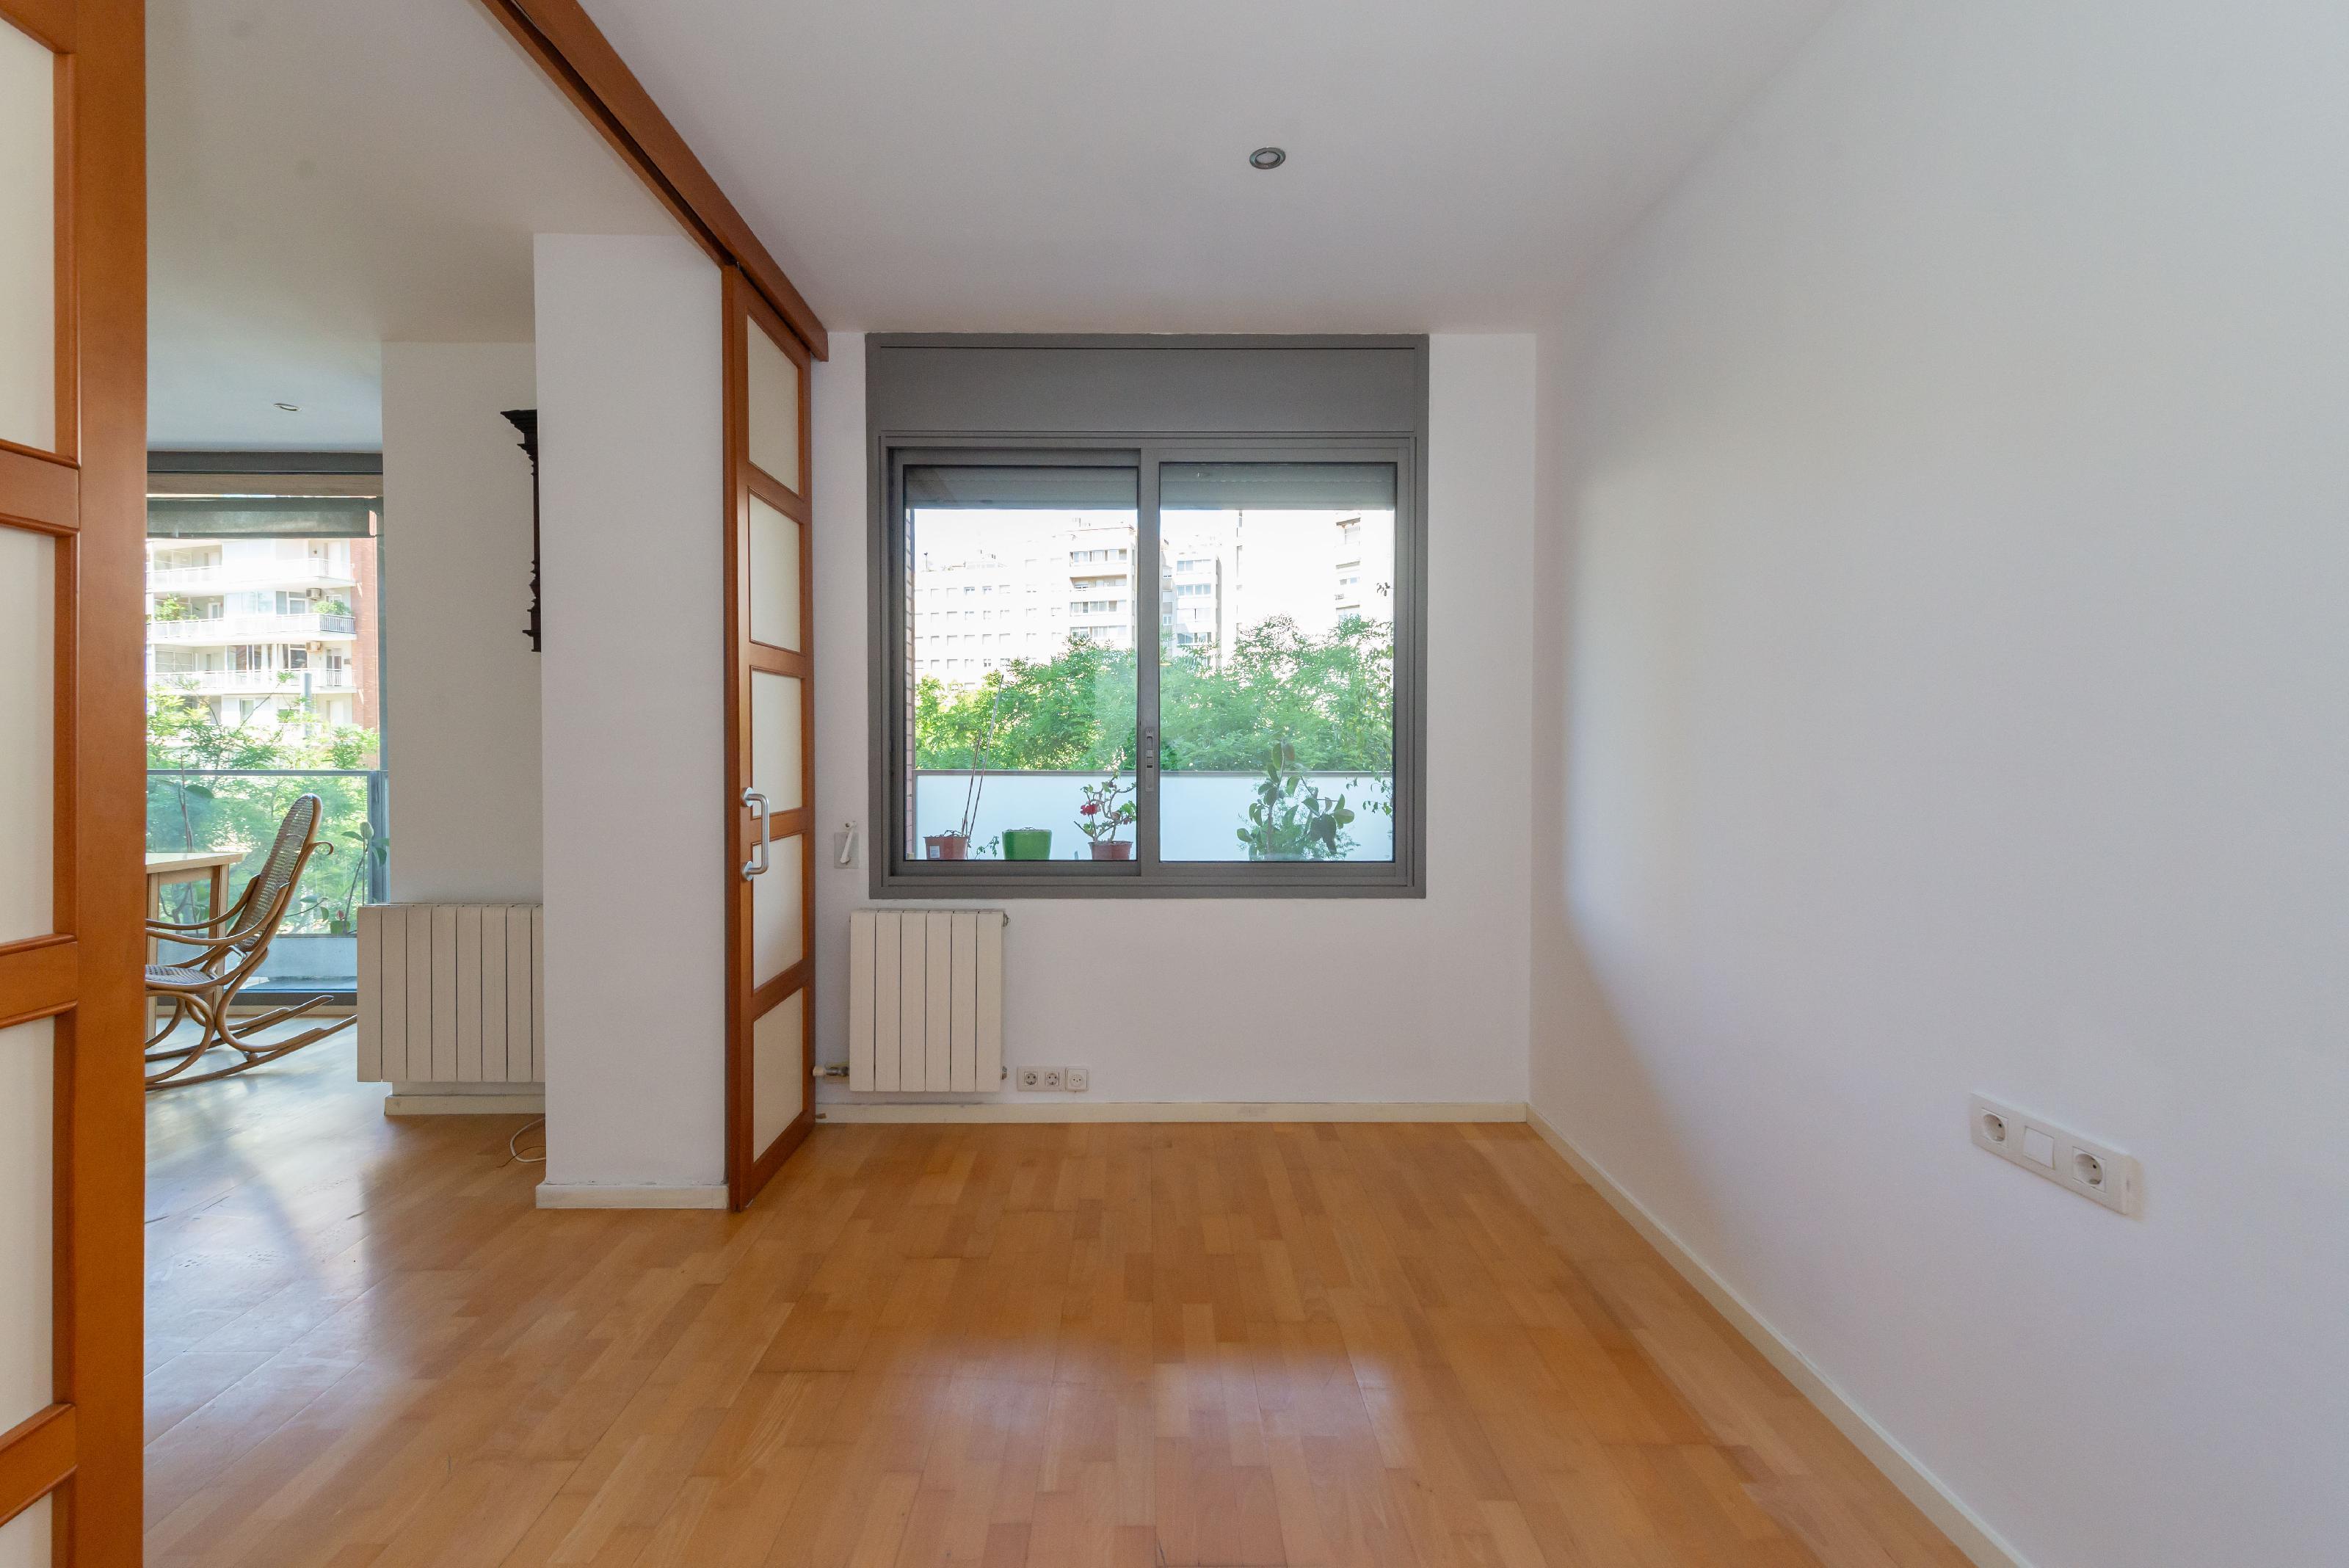 251446 Flat for sale in Sarrià-Sant Gervasi, Tres Torres 12